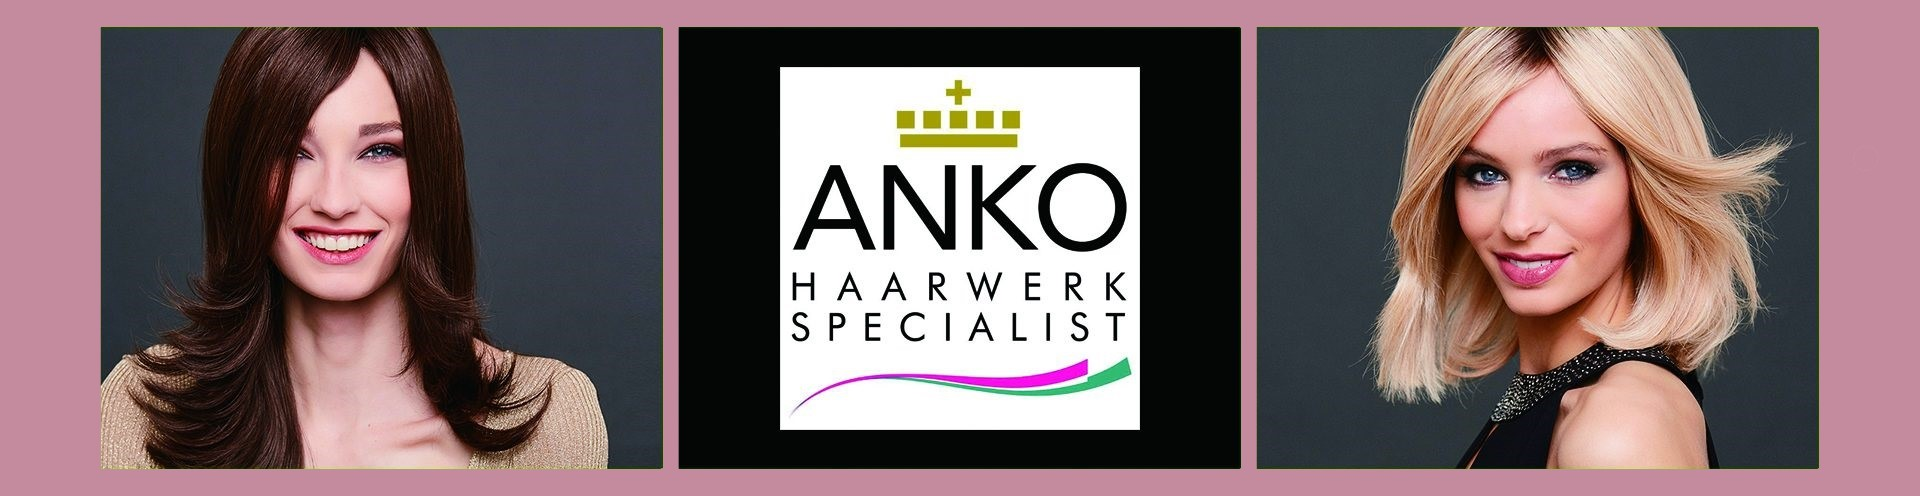 Anko-beeld-1920x496